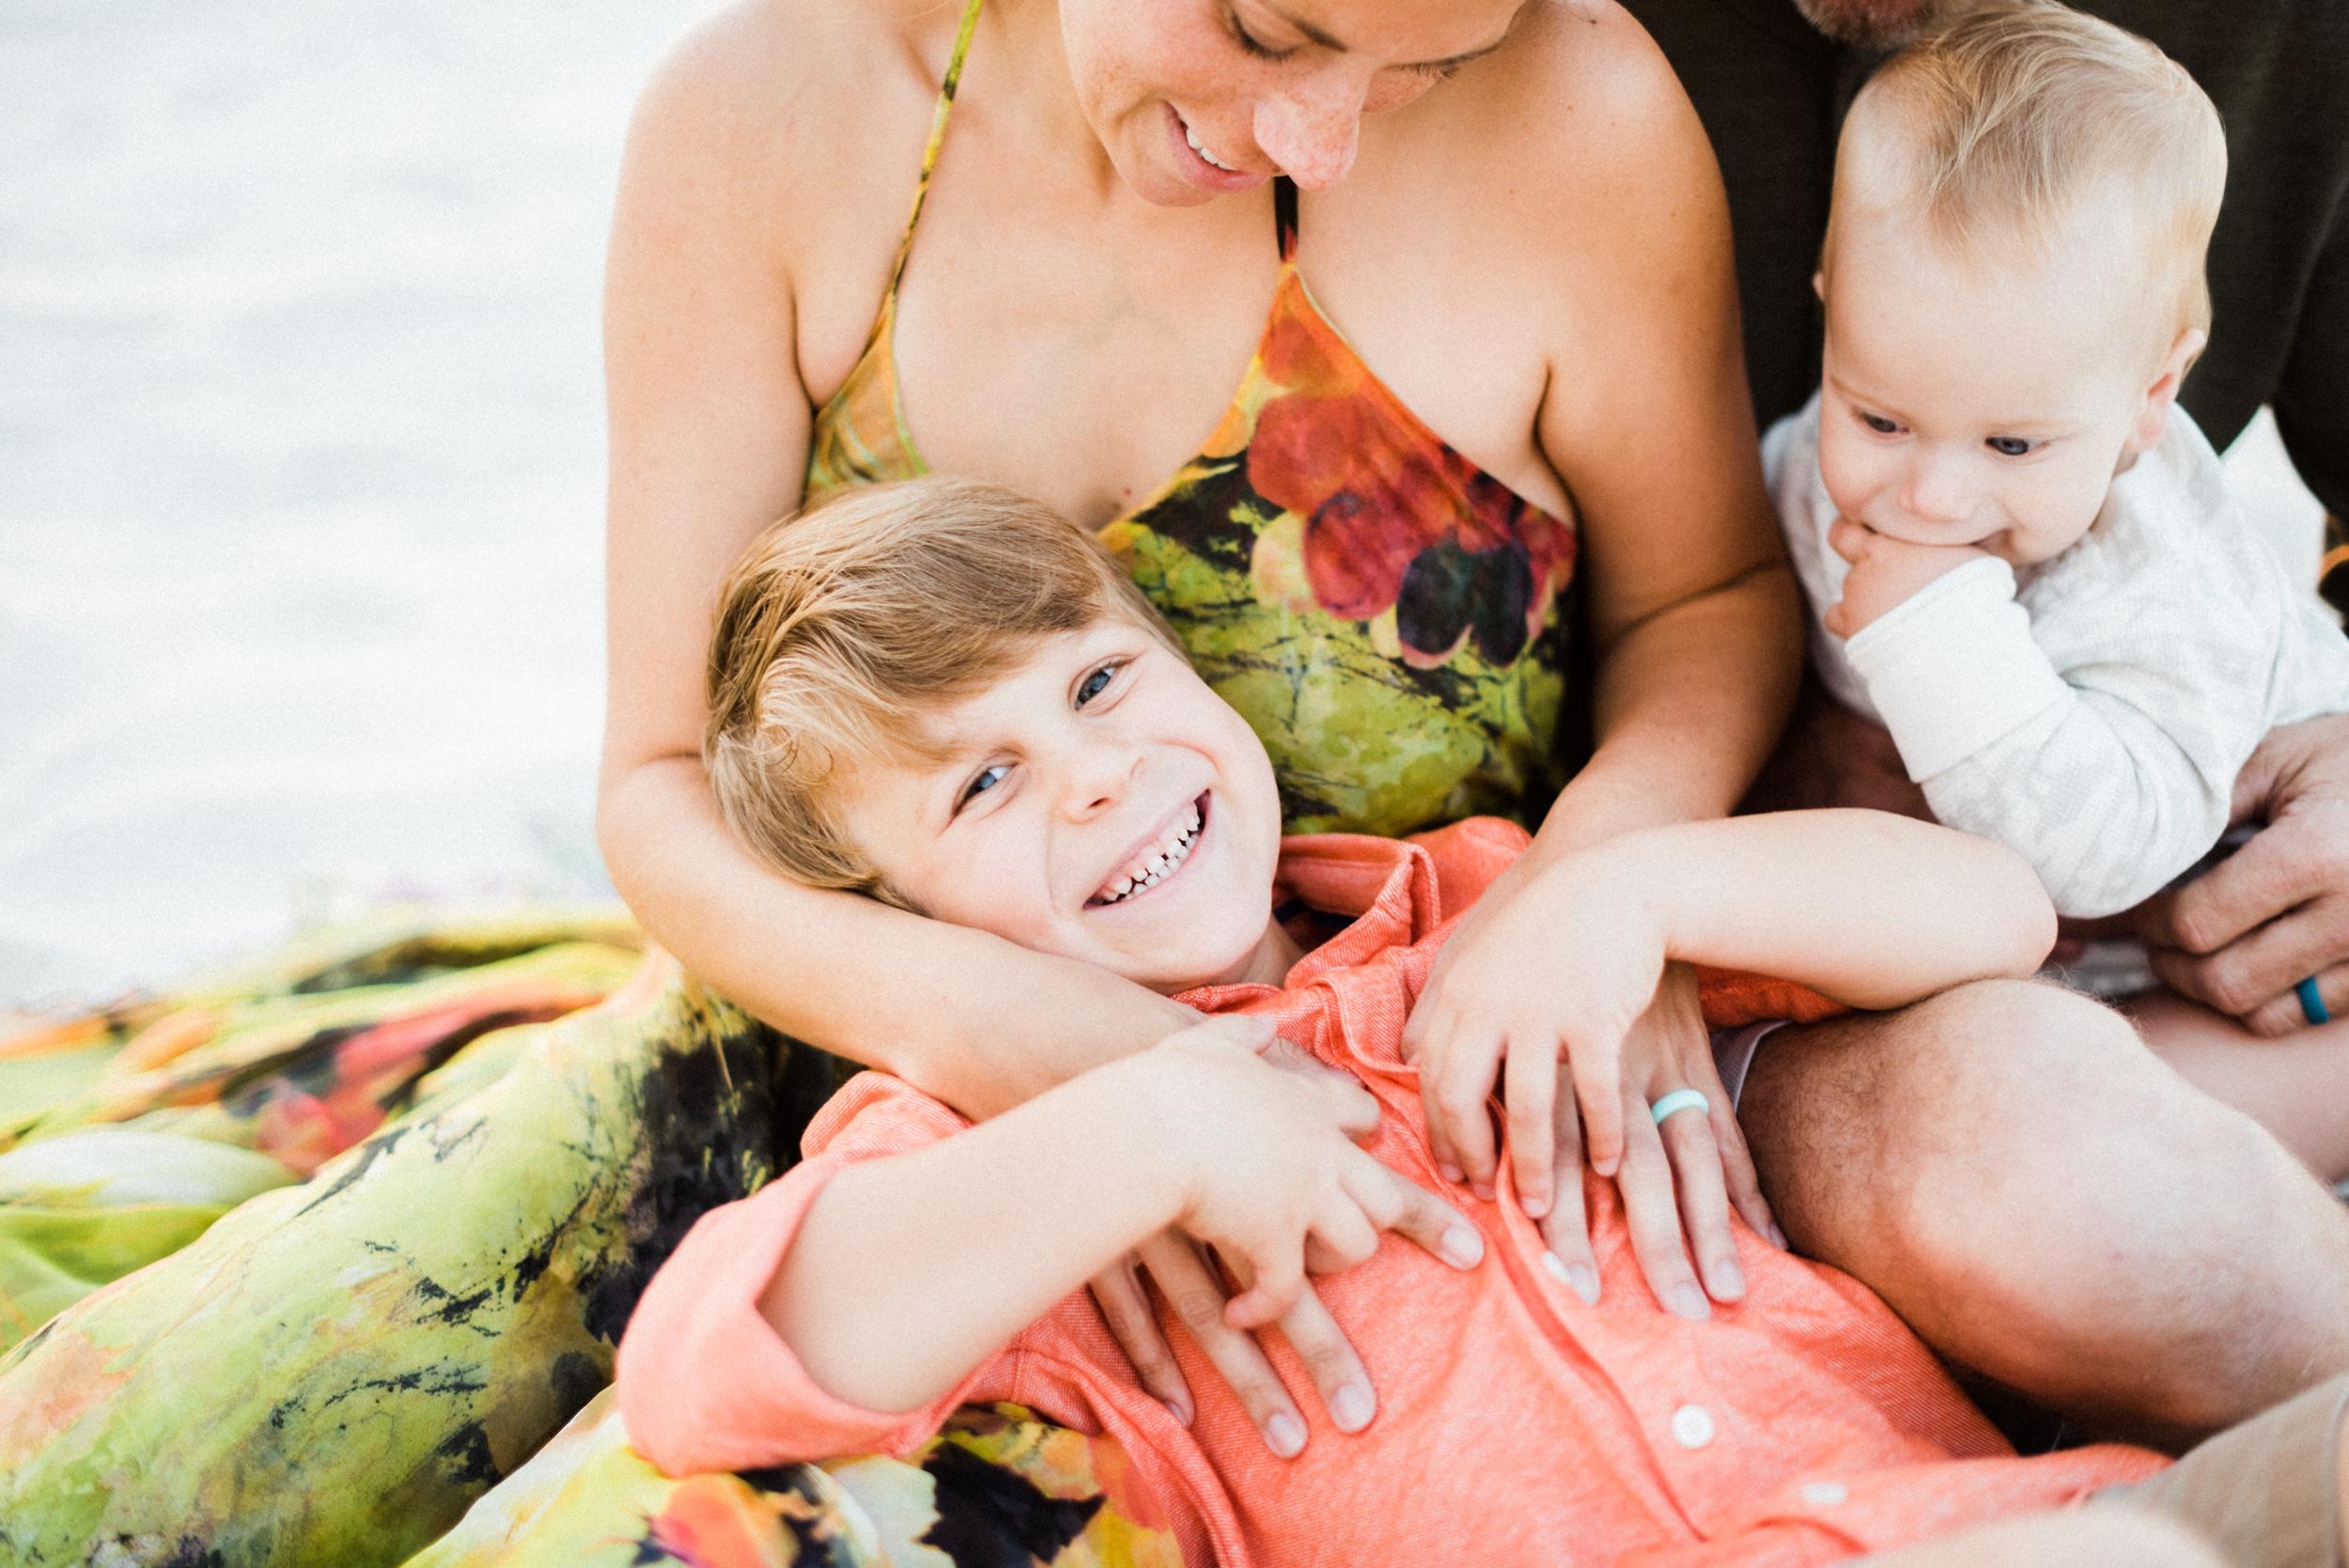 desiree-gardner-photography-pairs-france-monet-garden-monets-couple-wedding-engagement-giverny-30-a-30a-florida_0076.jpg